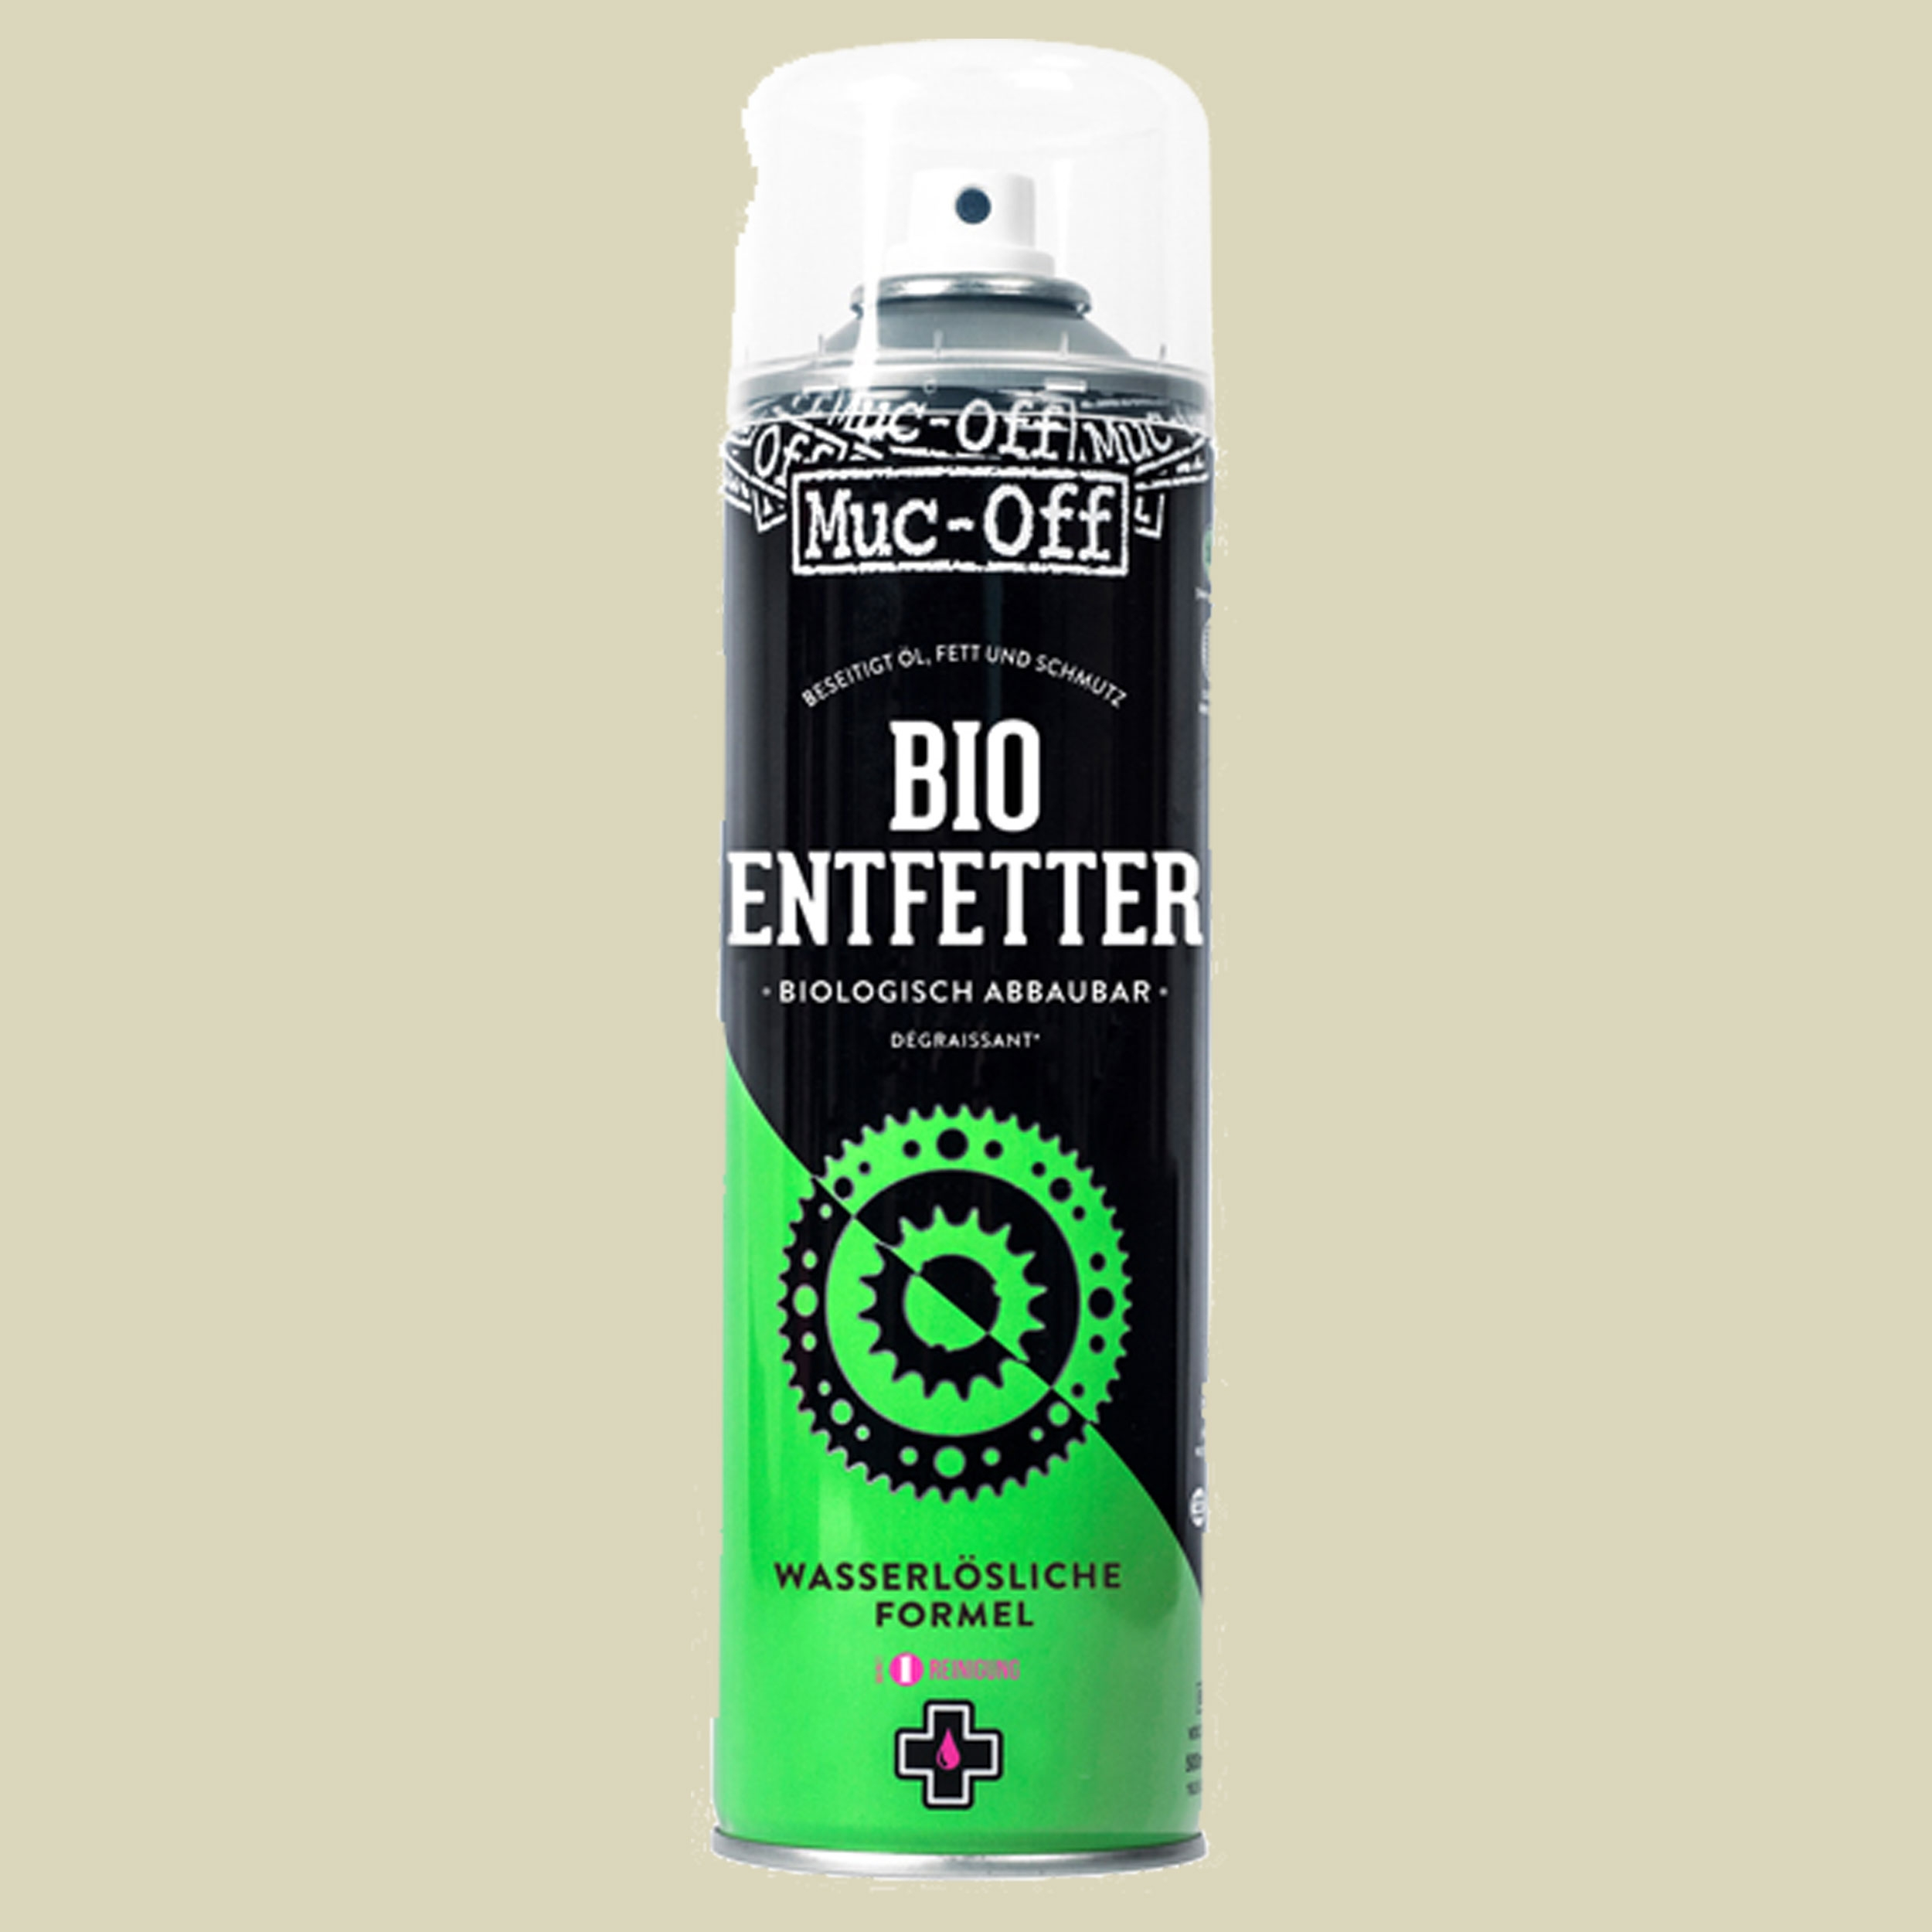 Muc-Off Bio Entfetter De-Greaser Aerosol 500 ml Entfetter Fahrrad